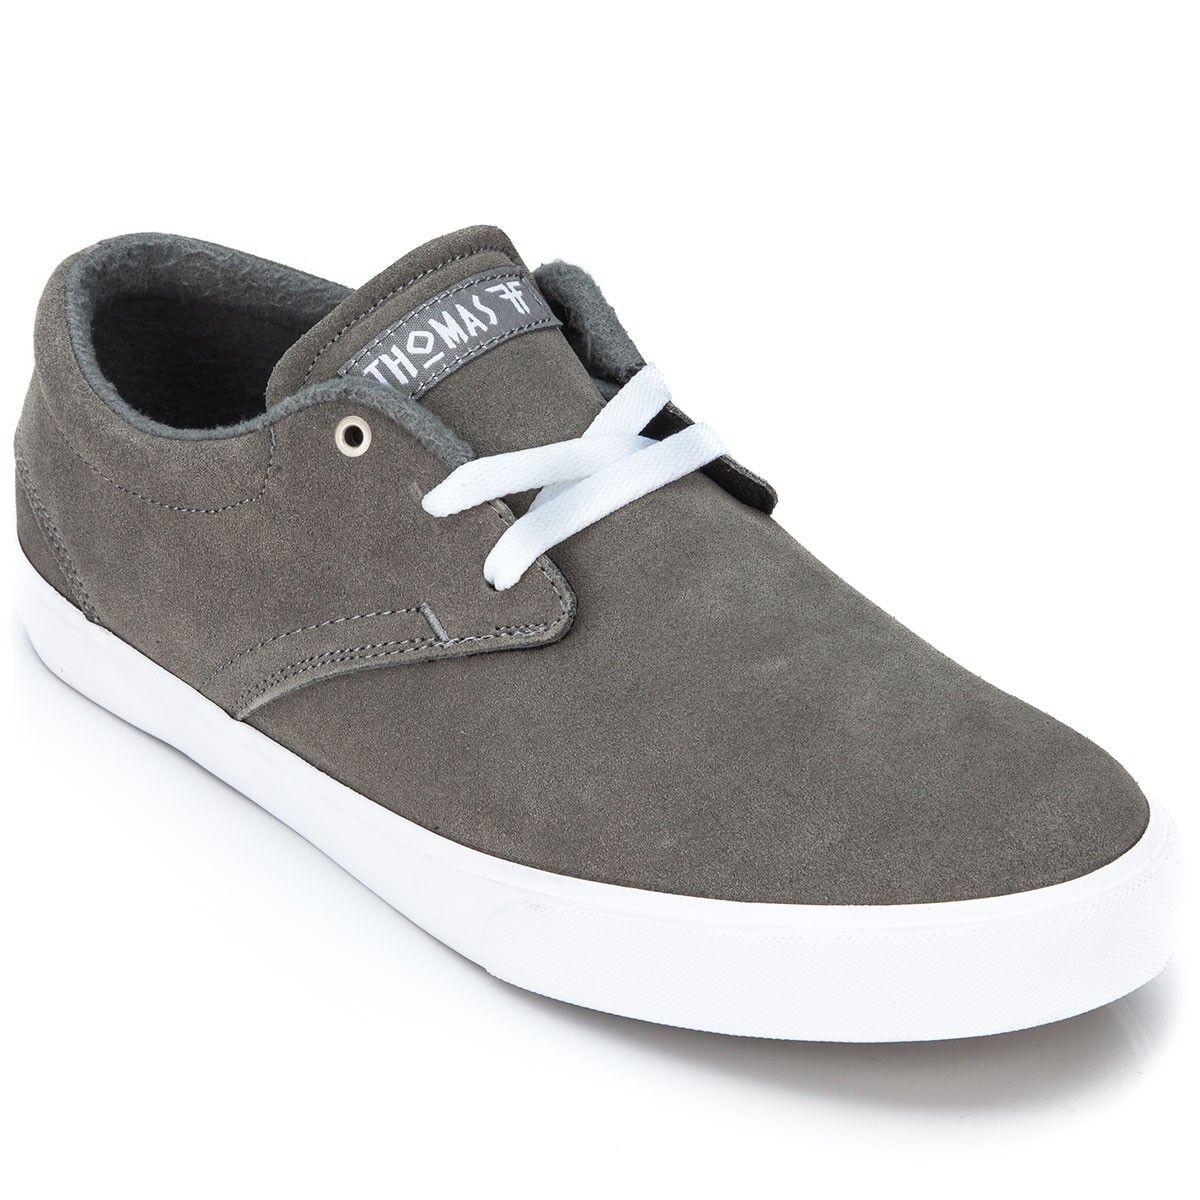 Fallen Shoes Spirit Cement Grey Jamie Thomas Pro FREE POST Skateboard Scarpe da Ginnastica